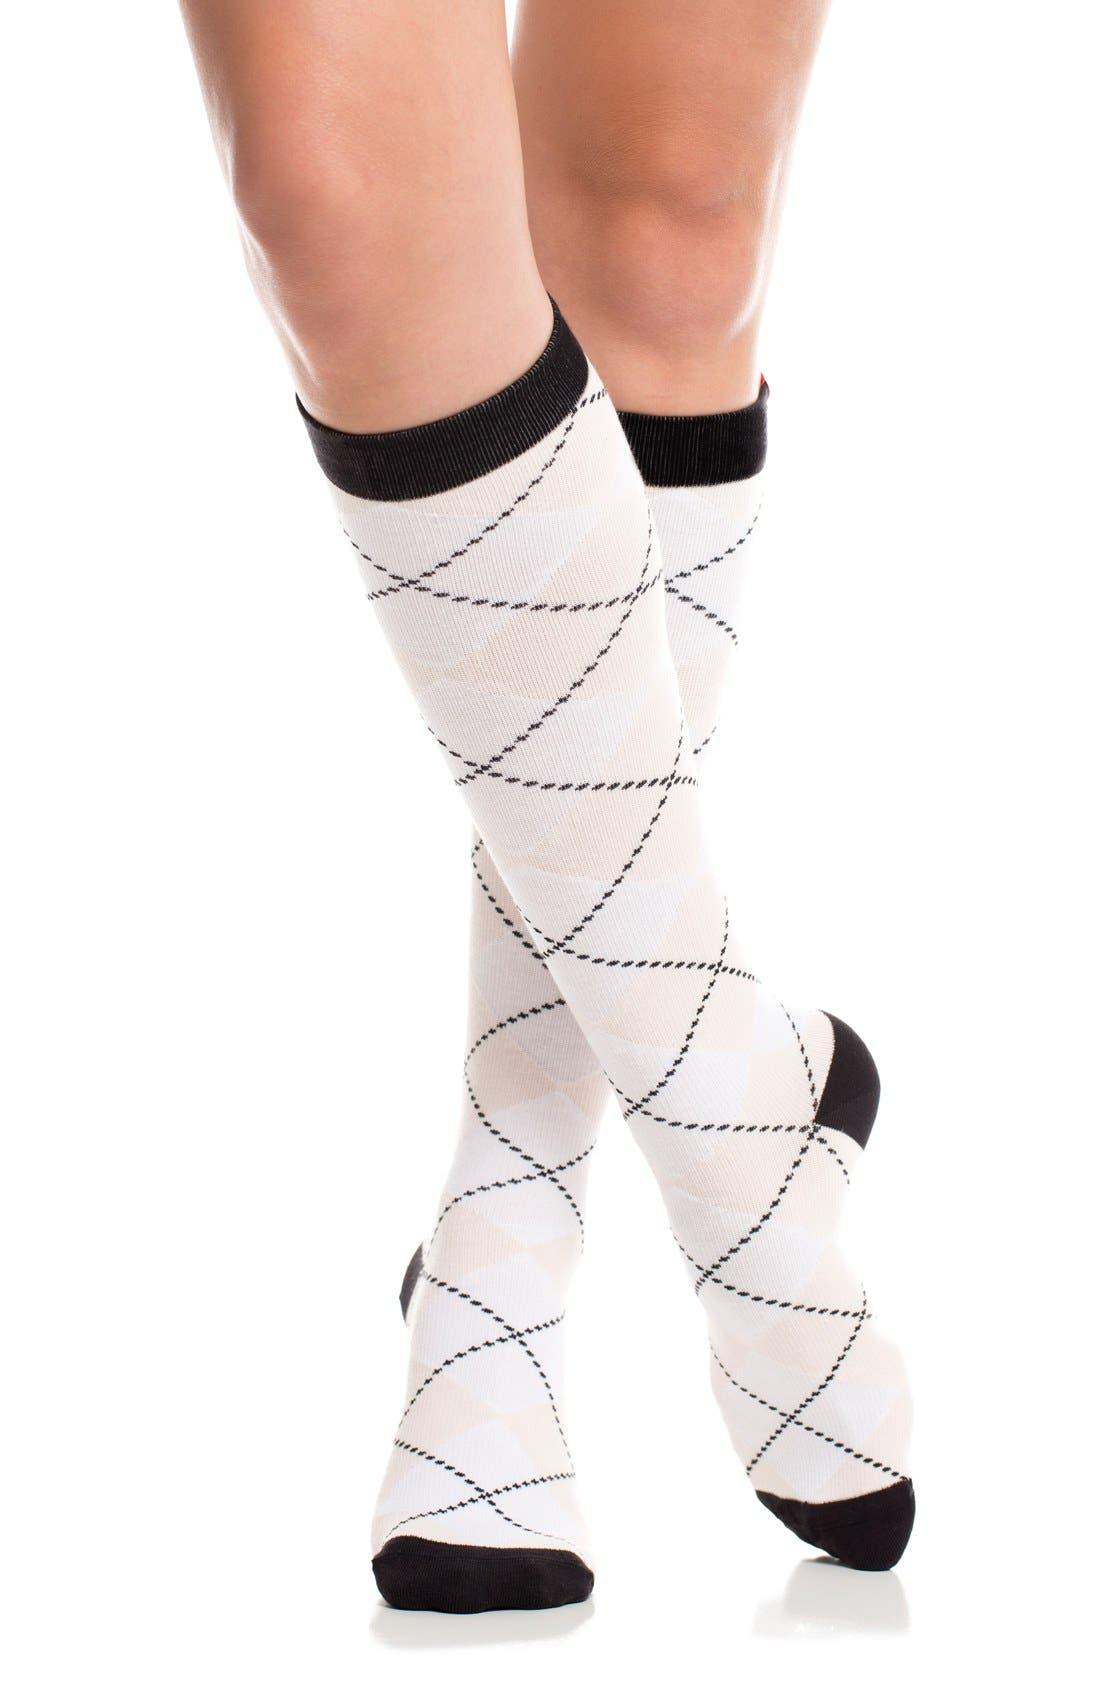 Argyle Graduated Compression Trouser Socks,                             Alternate thumbnail 2, color,                             White/ Blush